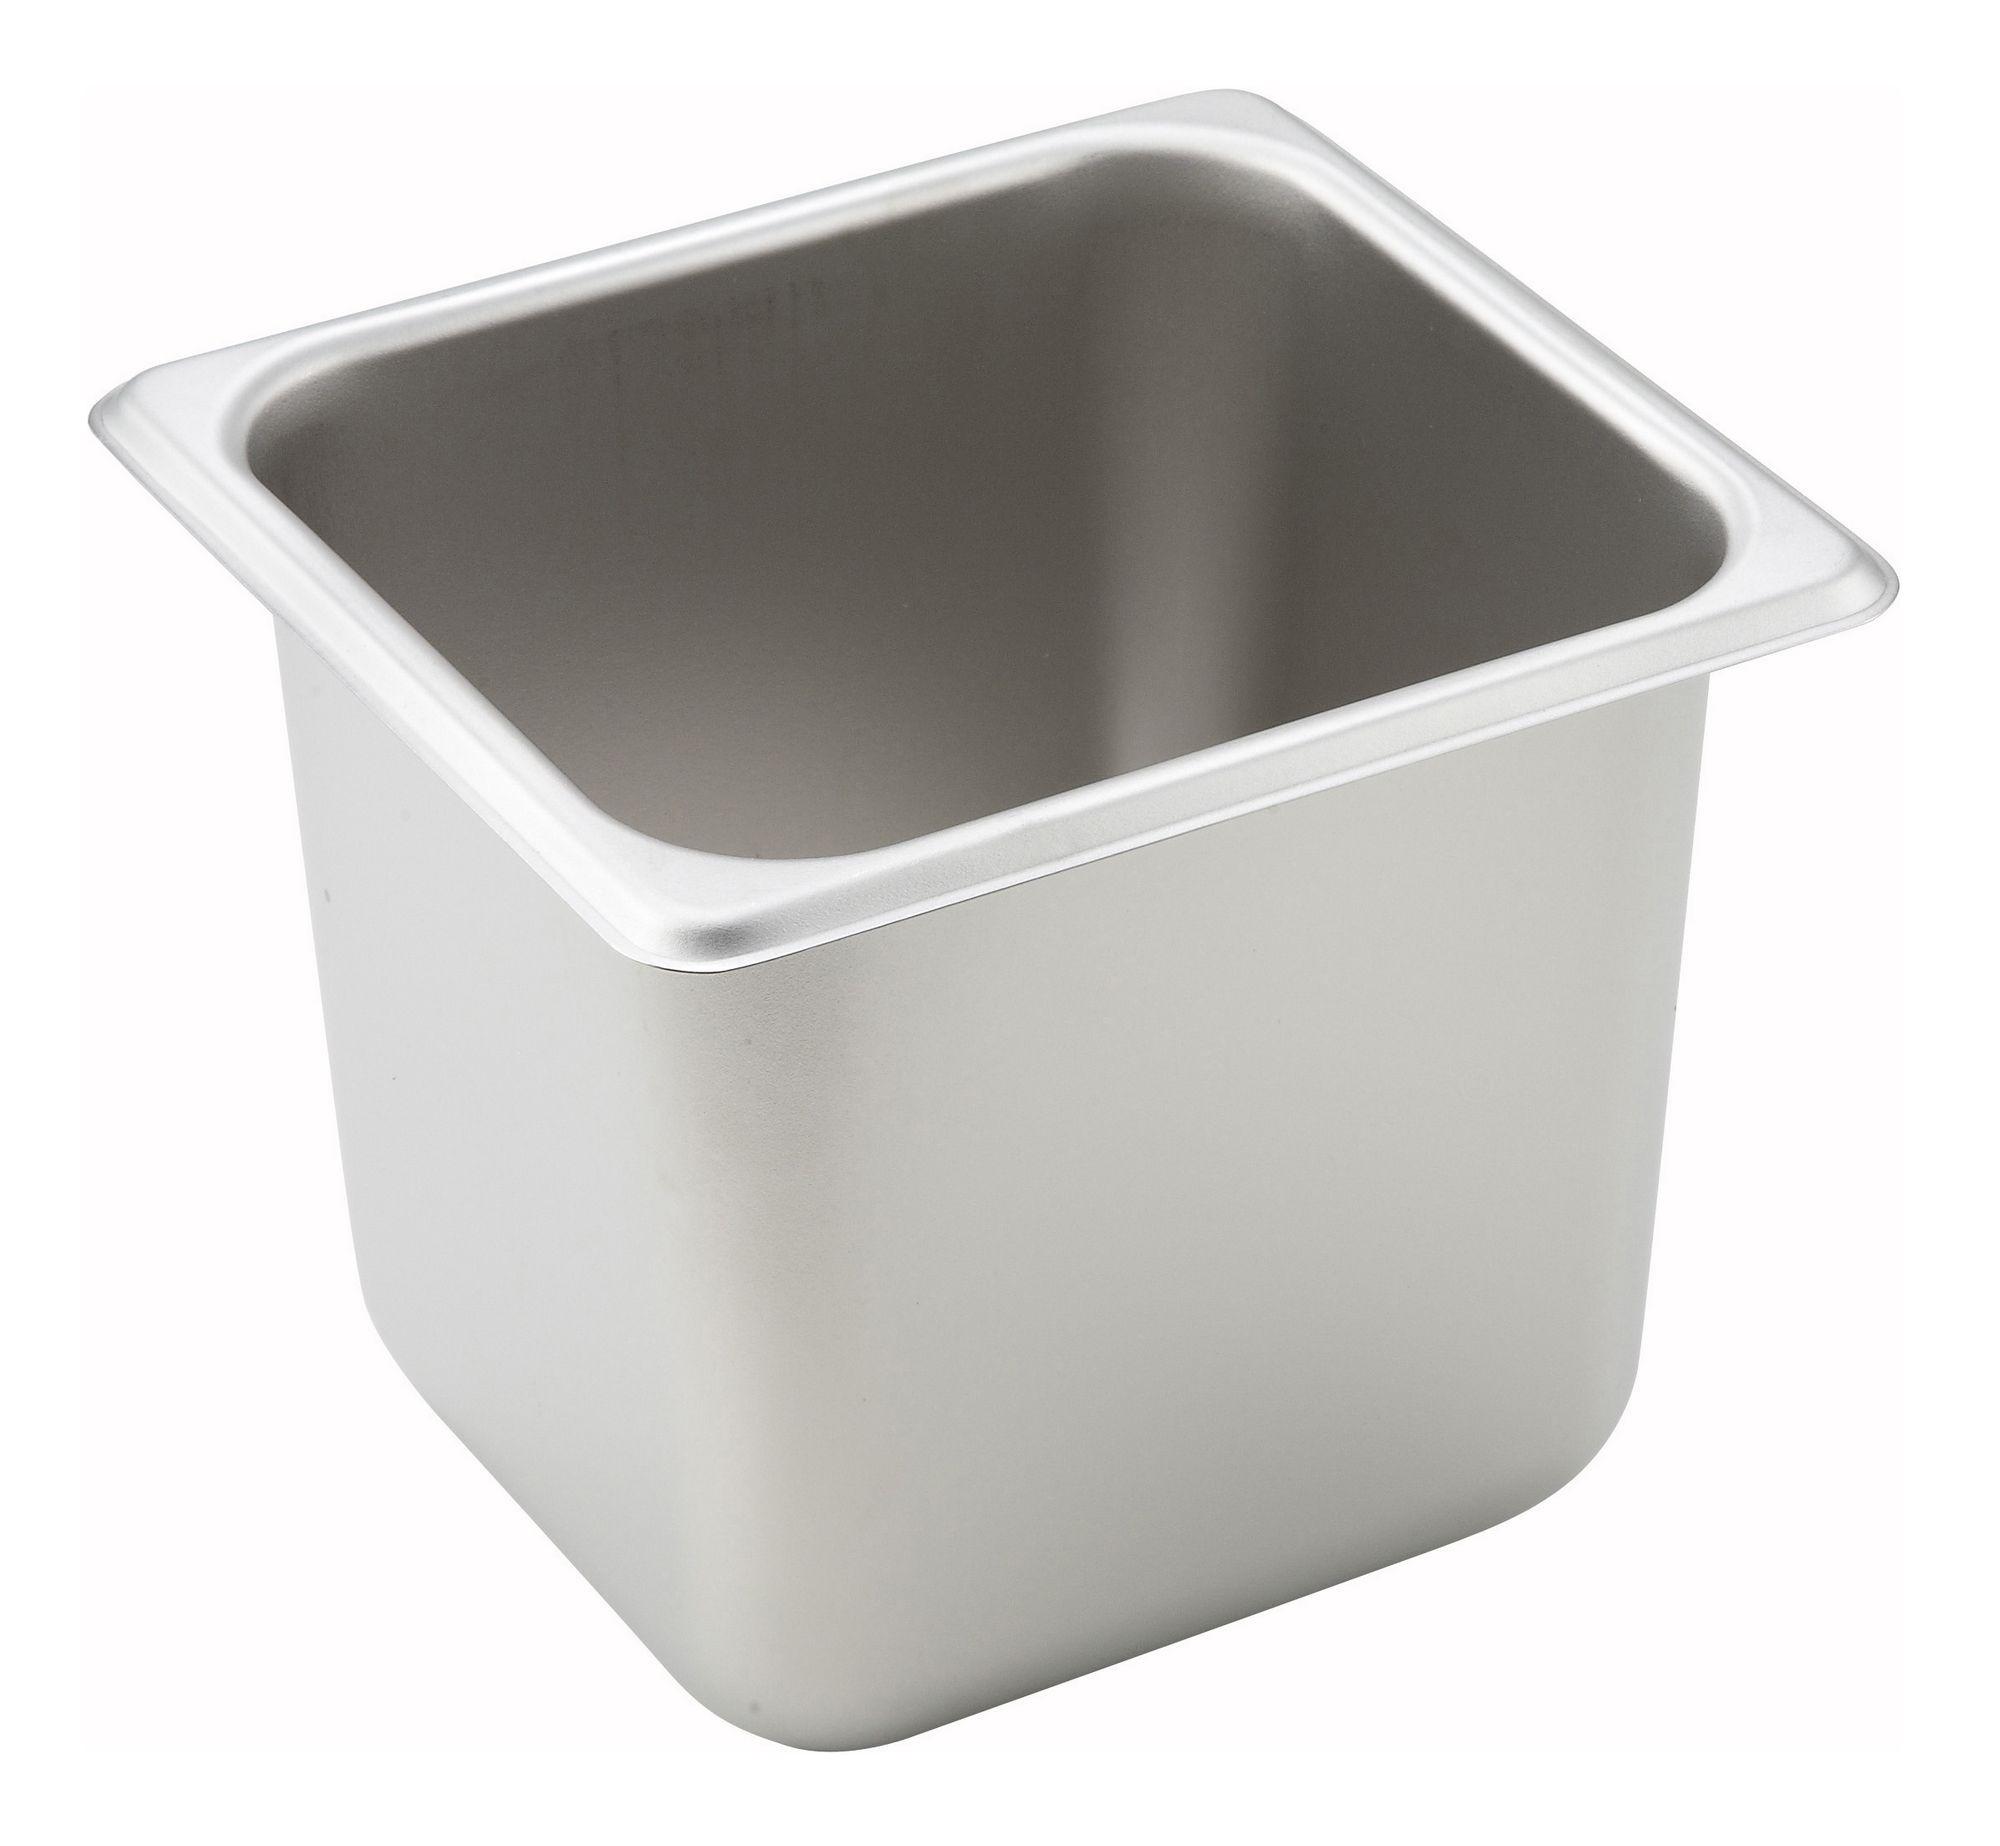 "Winco SPS6 1/6 Size Standard Weight Steam Table Pan 6"" Deep"